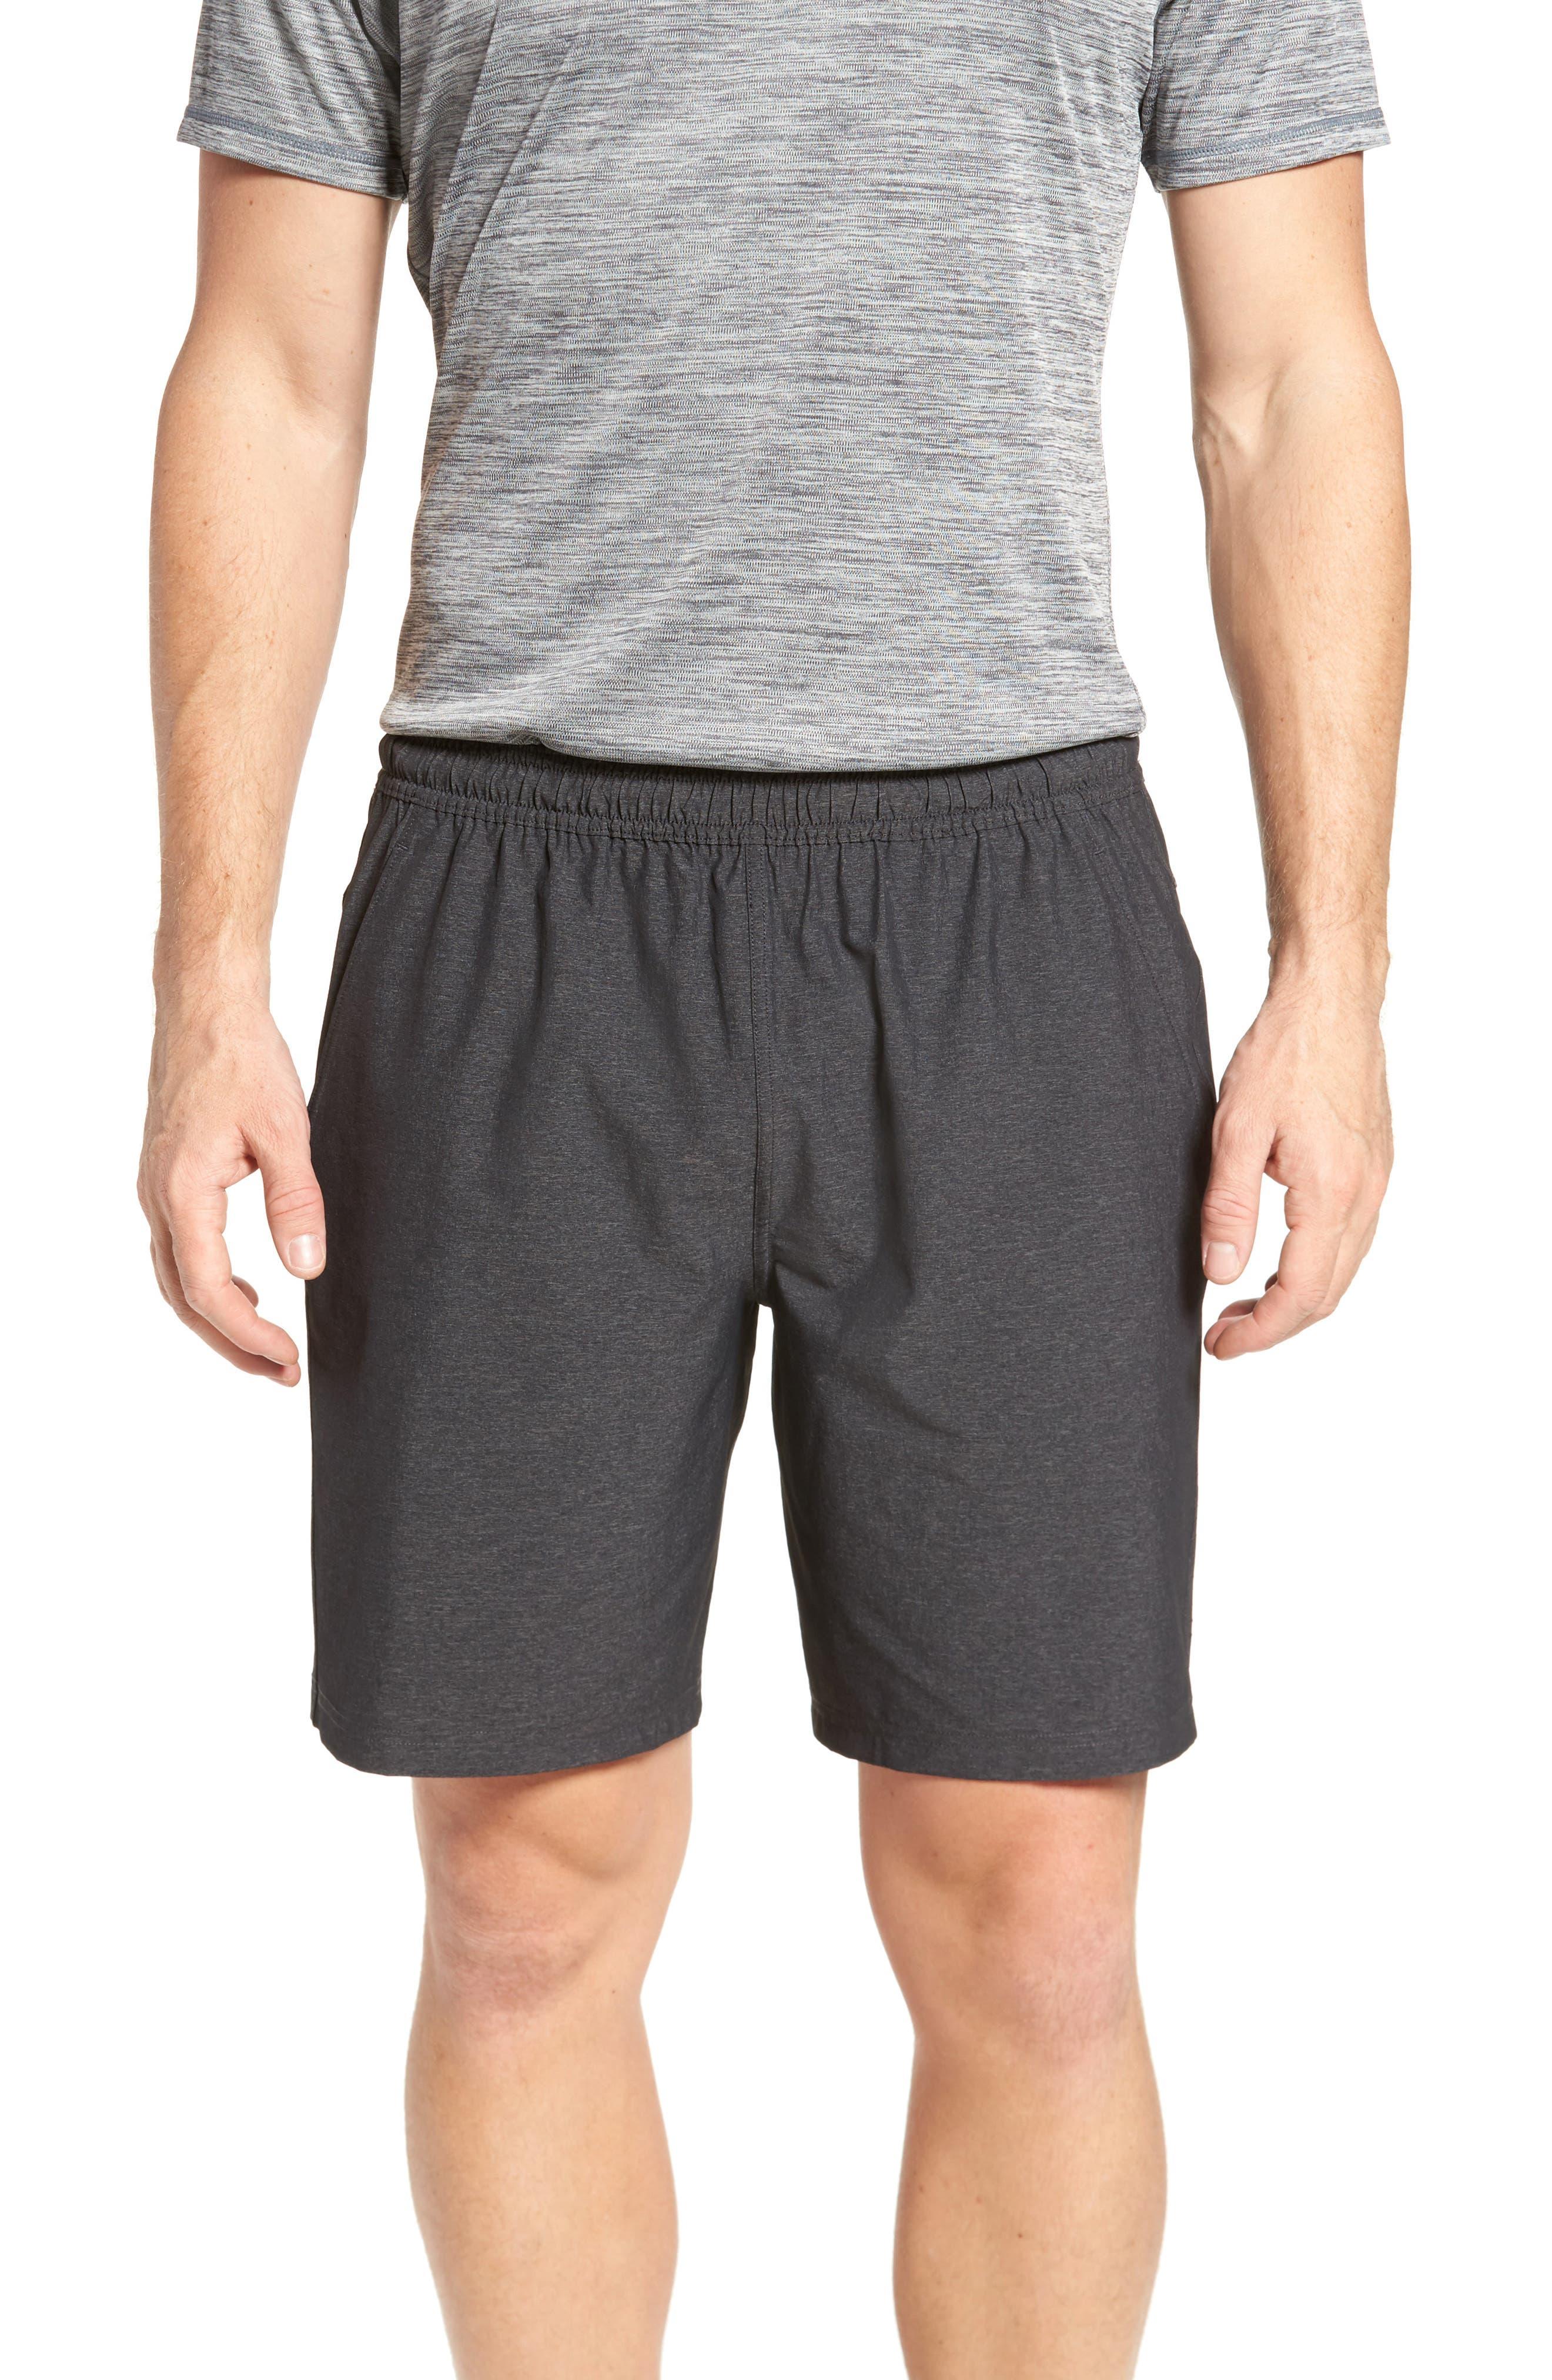 Main Image - Zella Graphite Shorts